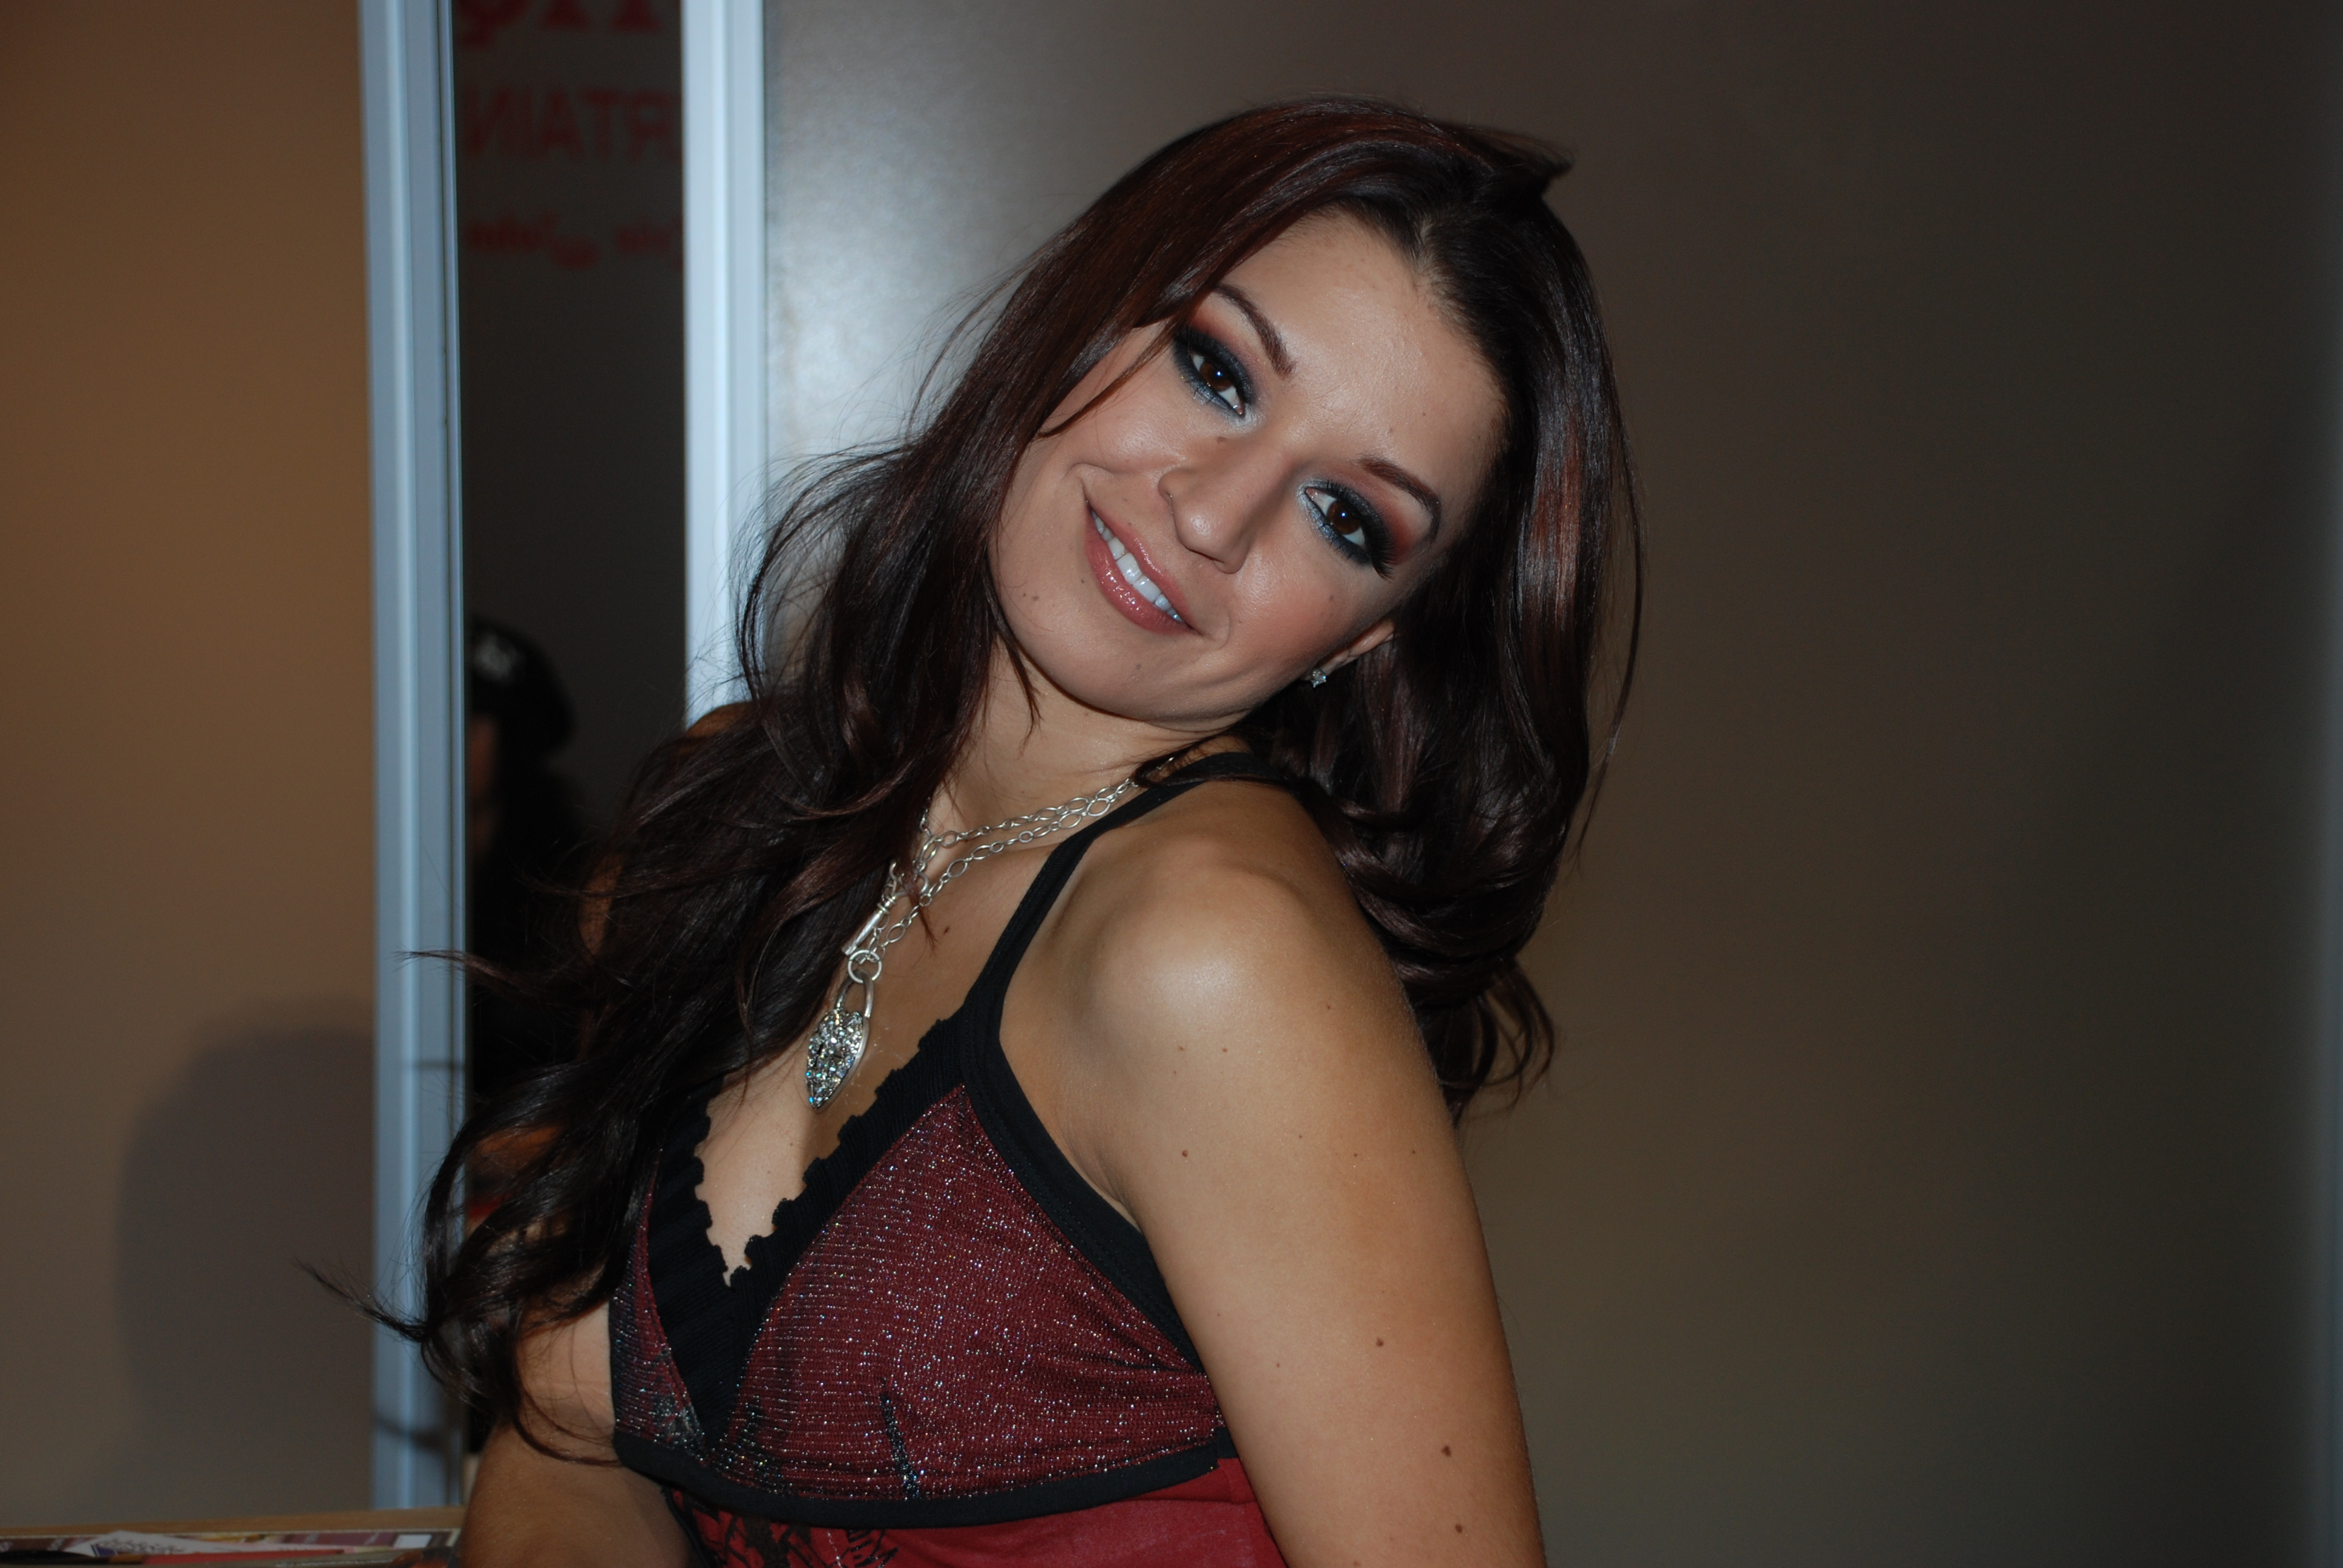 Ann Marie Rios Nude Photos 50